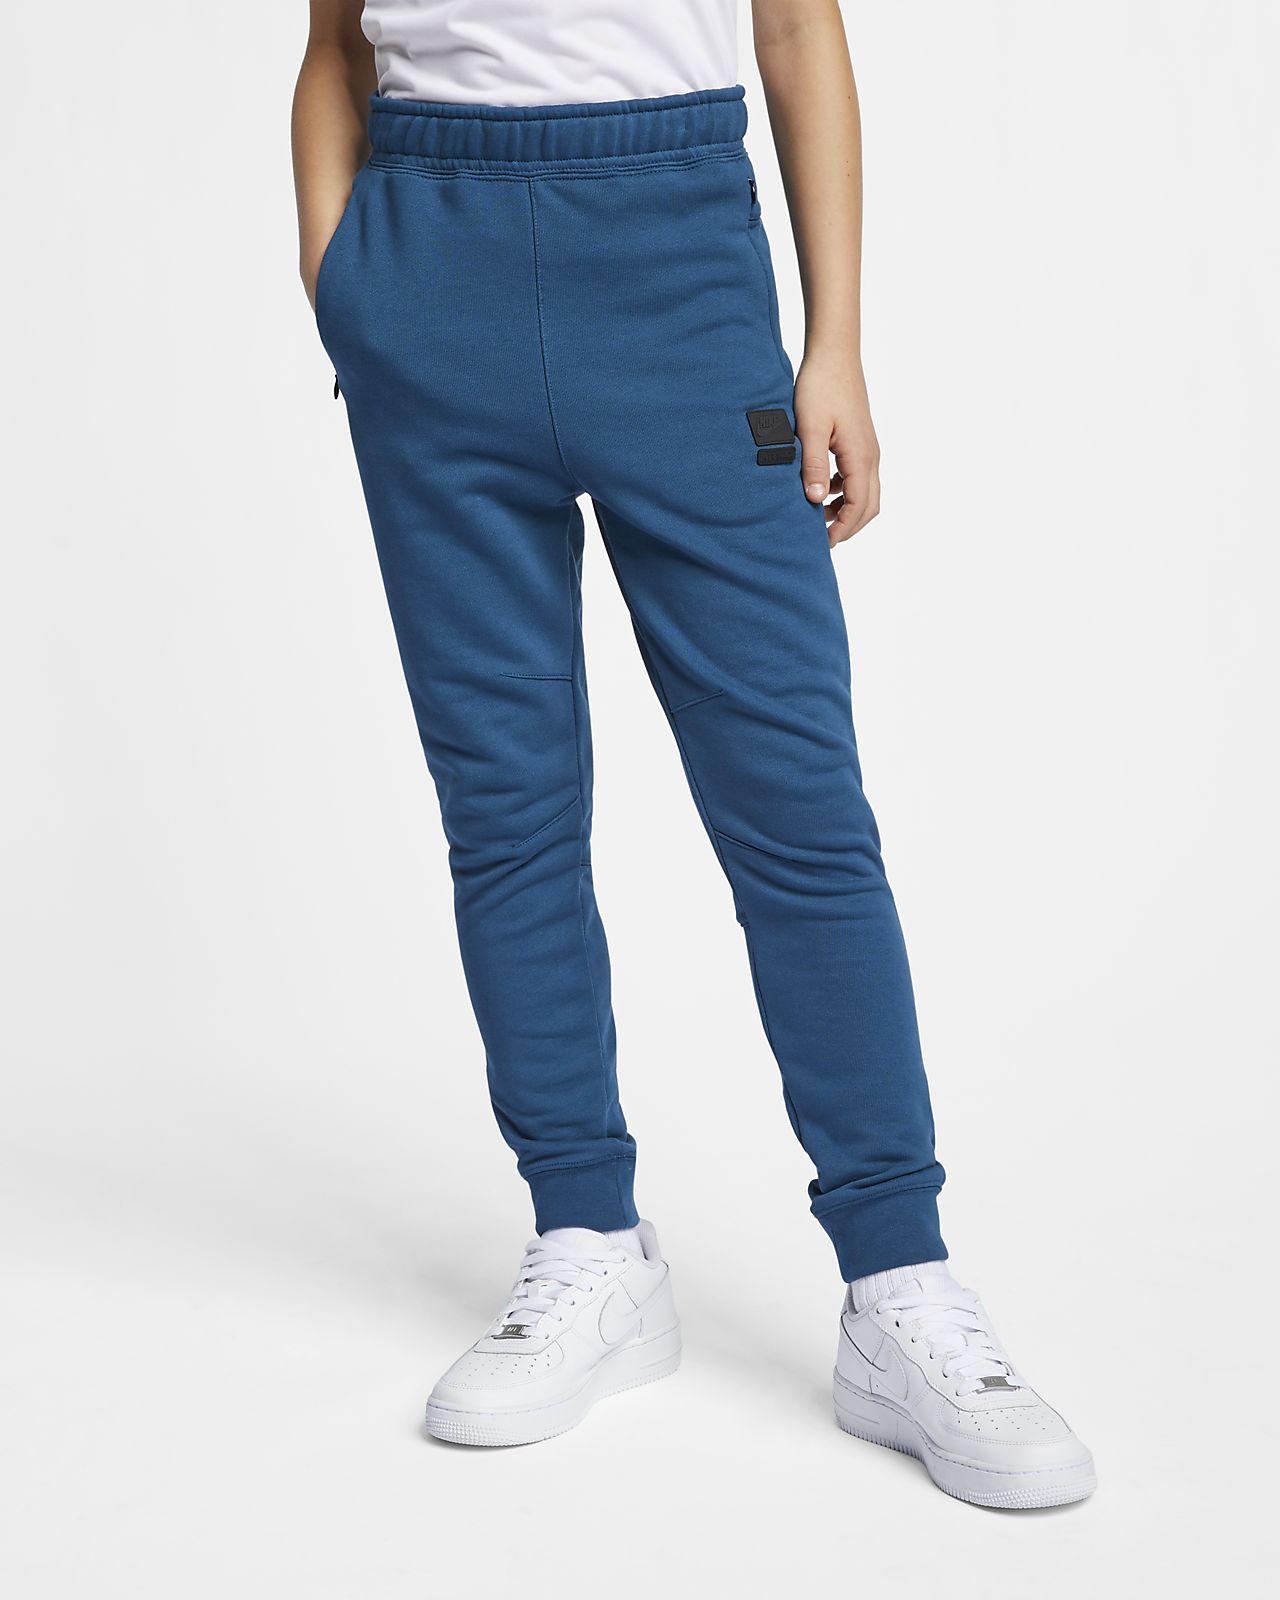 Byxor Nike Sportswear för killar